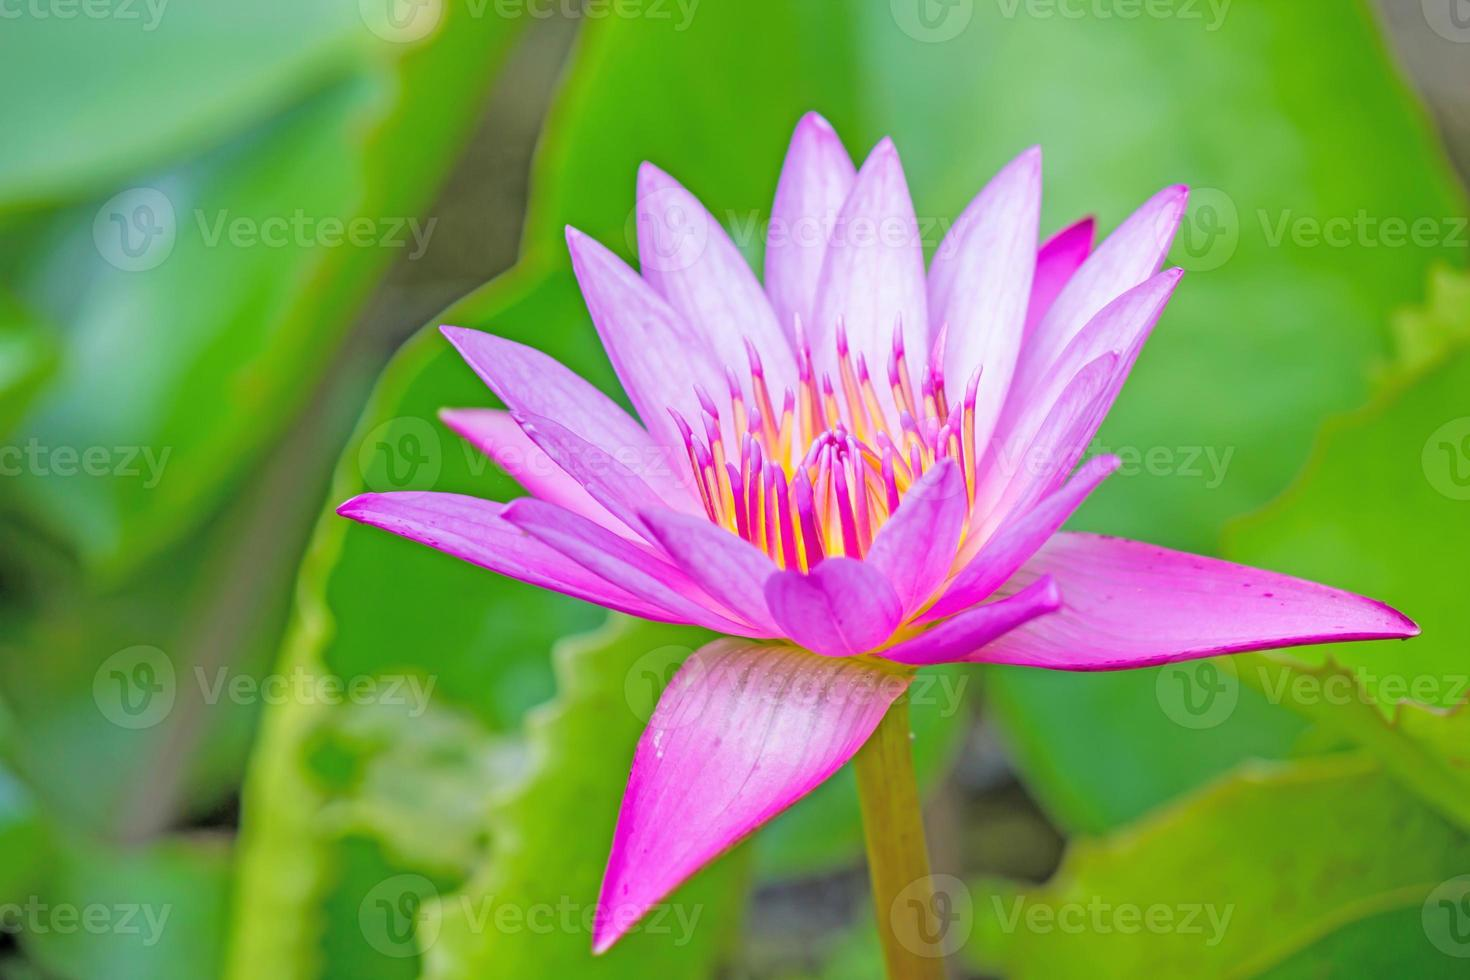 flor de lótus e plantas de flores de lótus foto